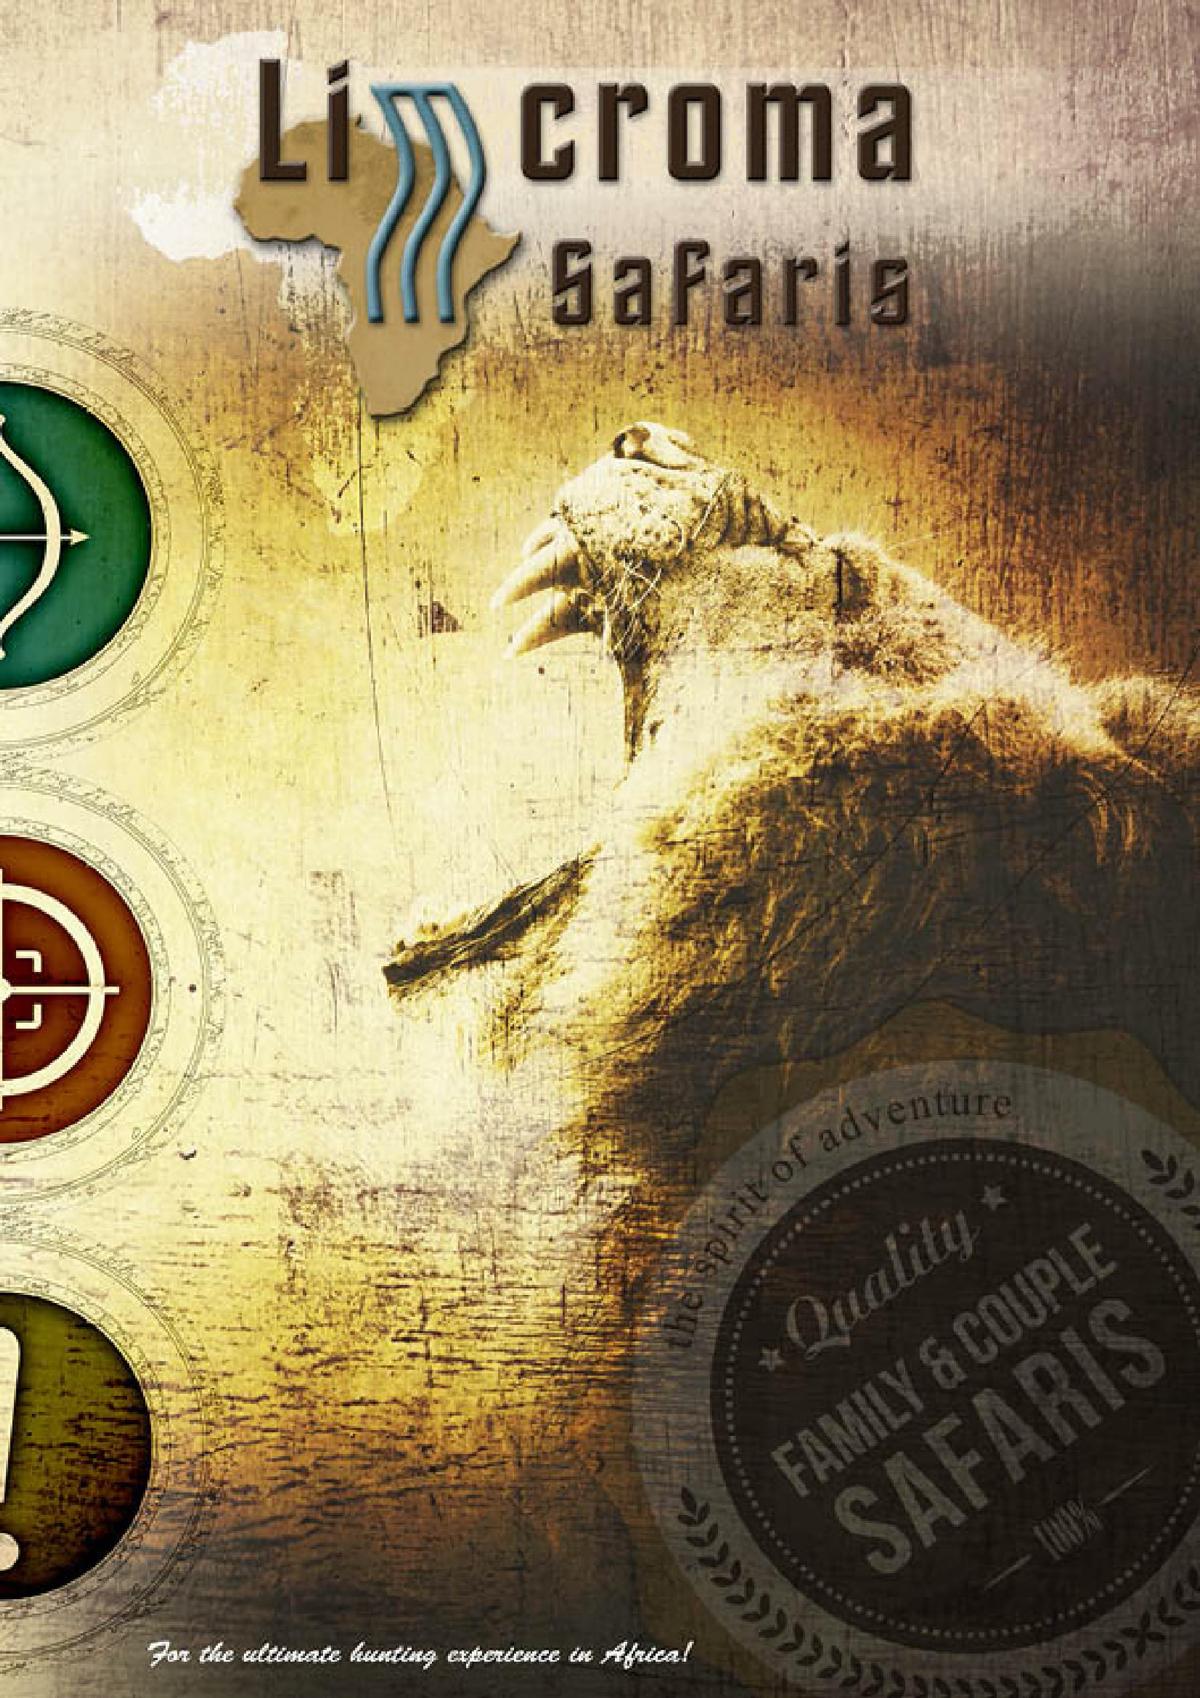 limcroma-safaris-01.jpg